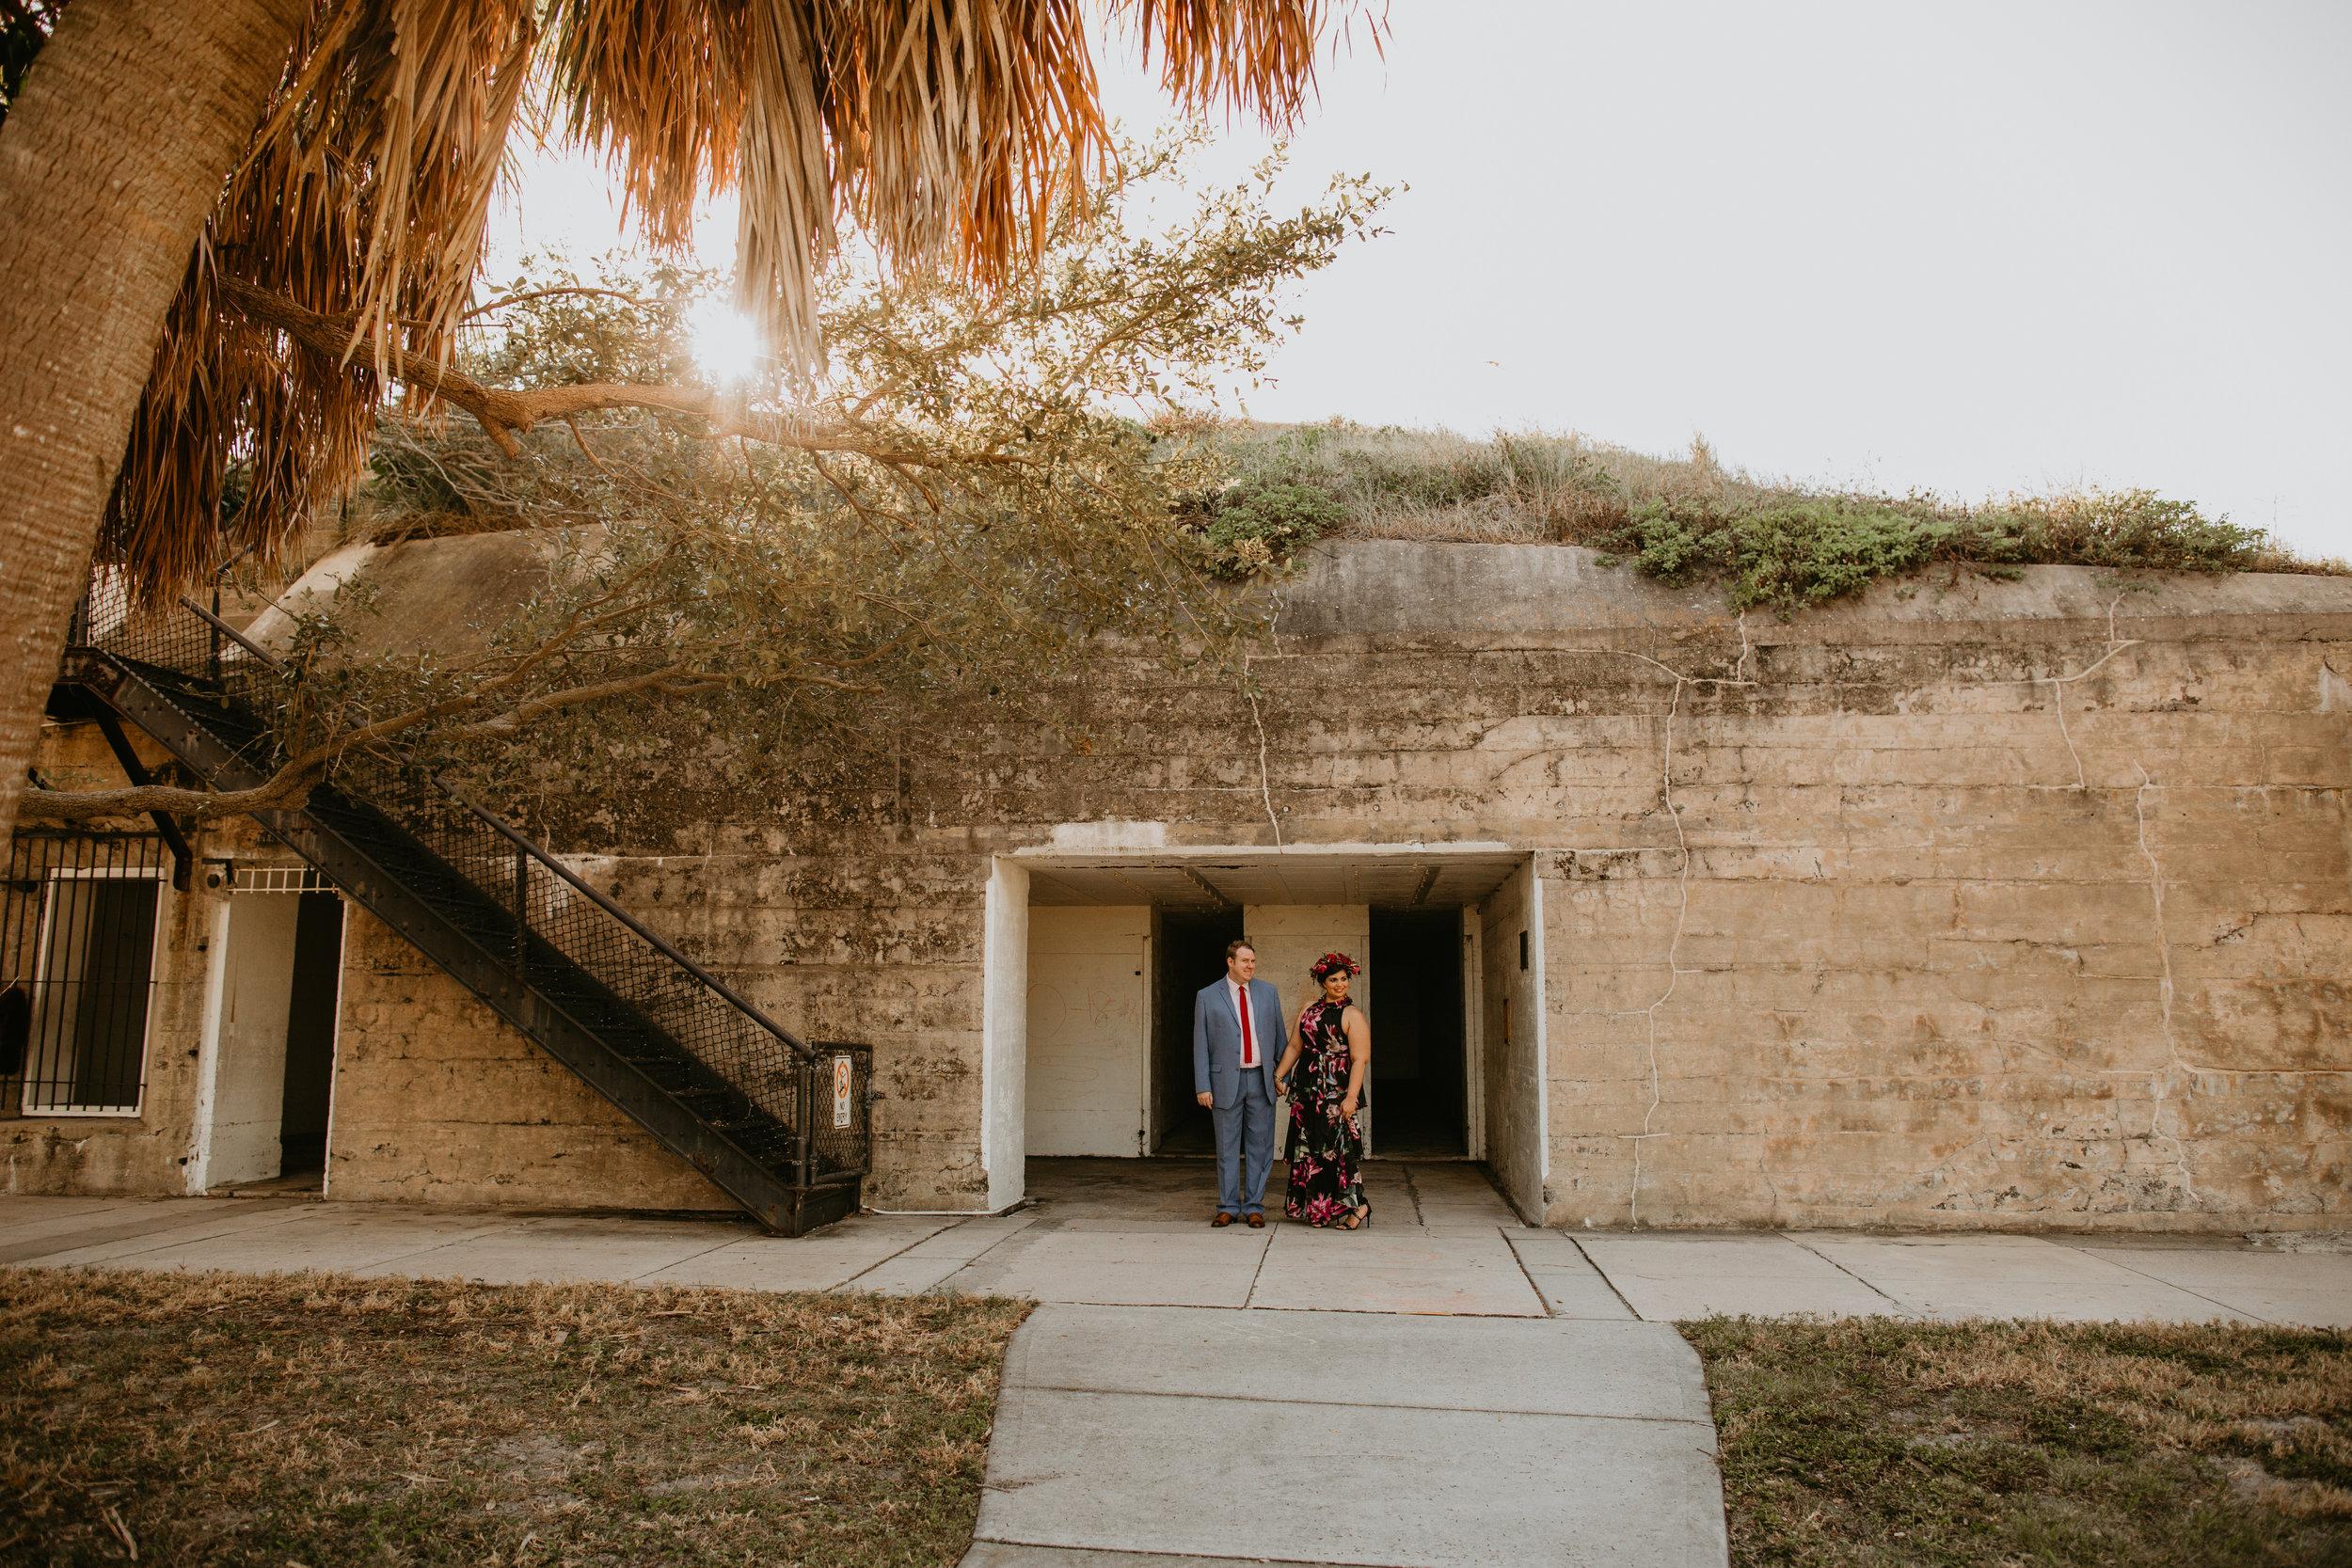 Fort Desoto St Pete Florida-Engagement Session-Sarah and Mark1.JPG